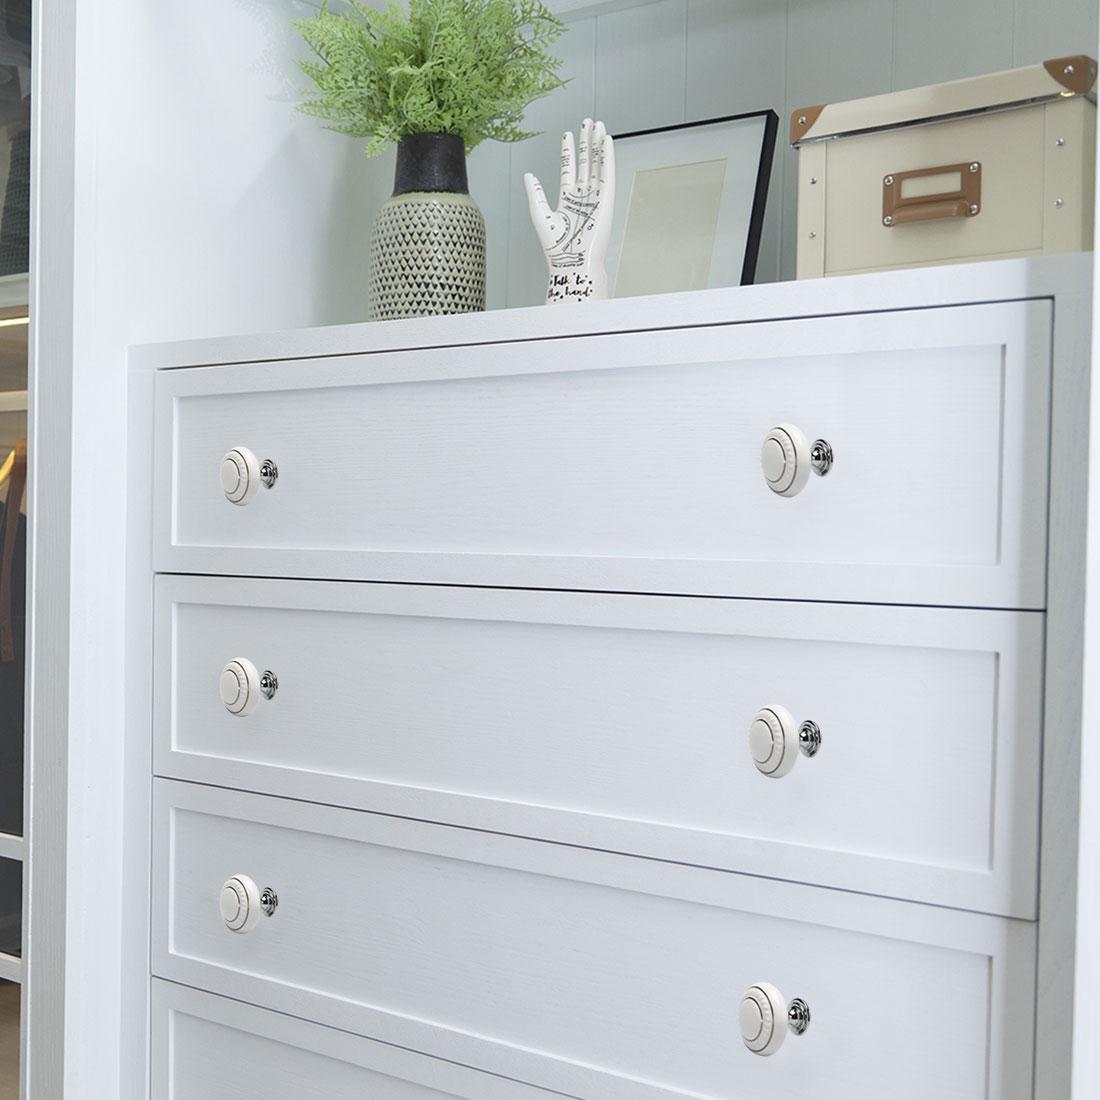 Ceramic Vintage Knobs Drawer Pull Handle Cupboard Dresser 6pcs Gold Circle White - image 1 of 8